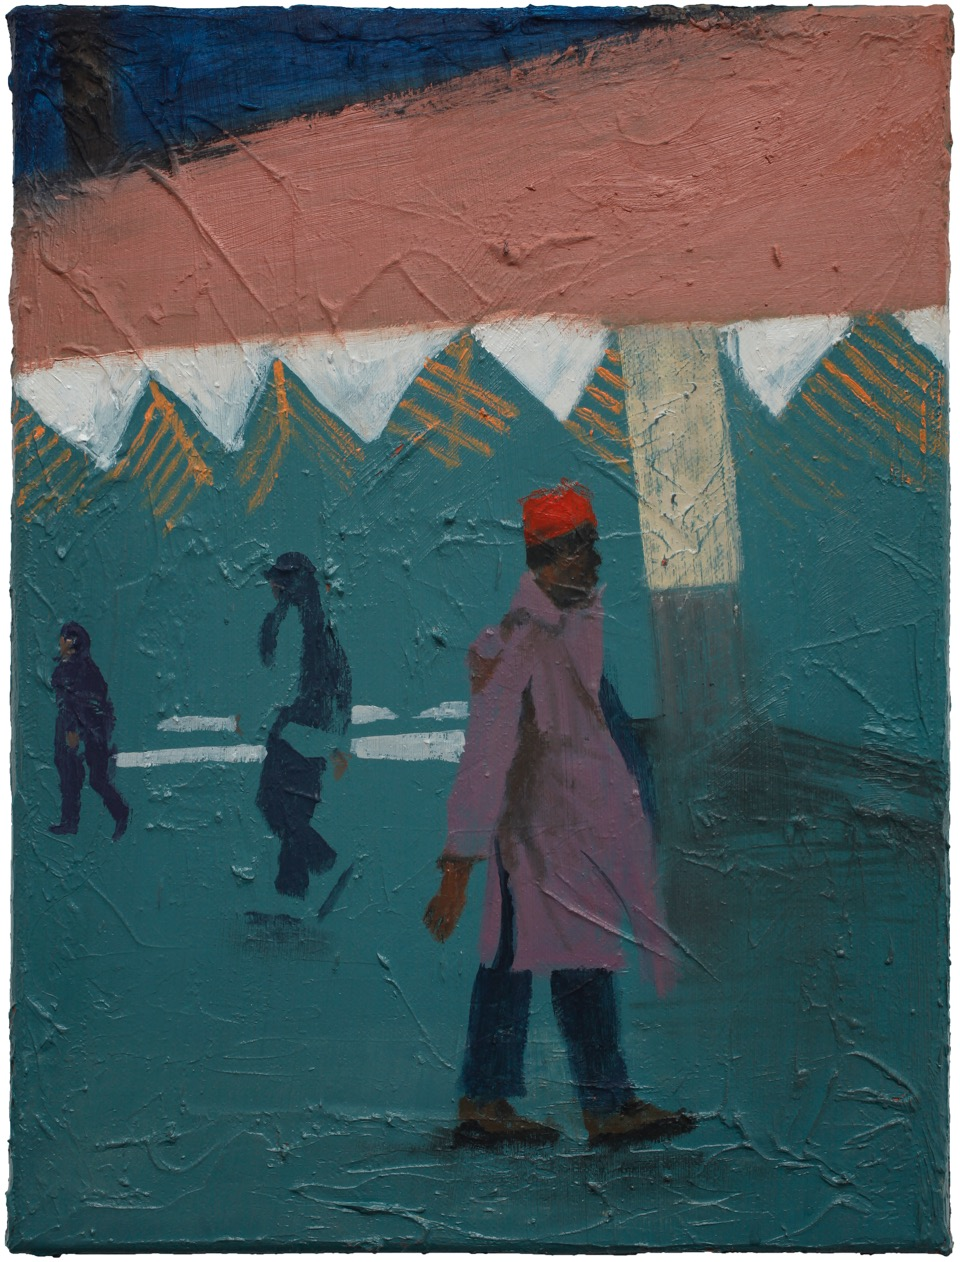 Henri Haake | O.T. (MM I) – 40 x 30 cm, Öl auf L., 2016